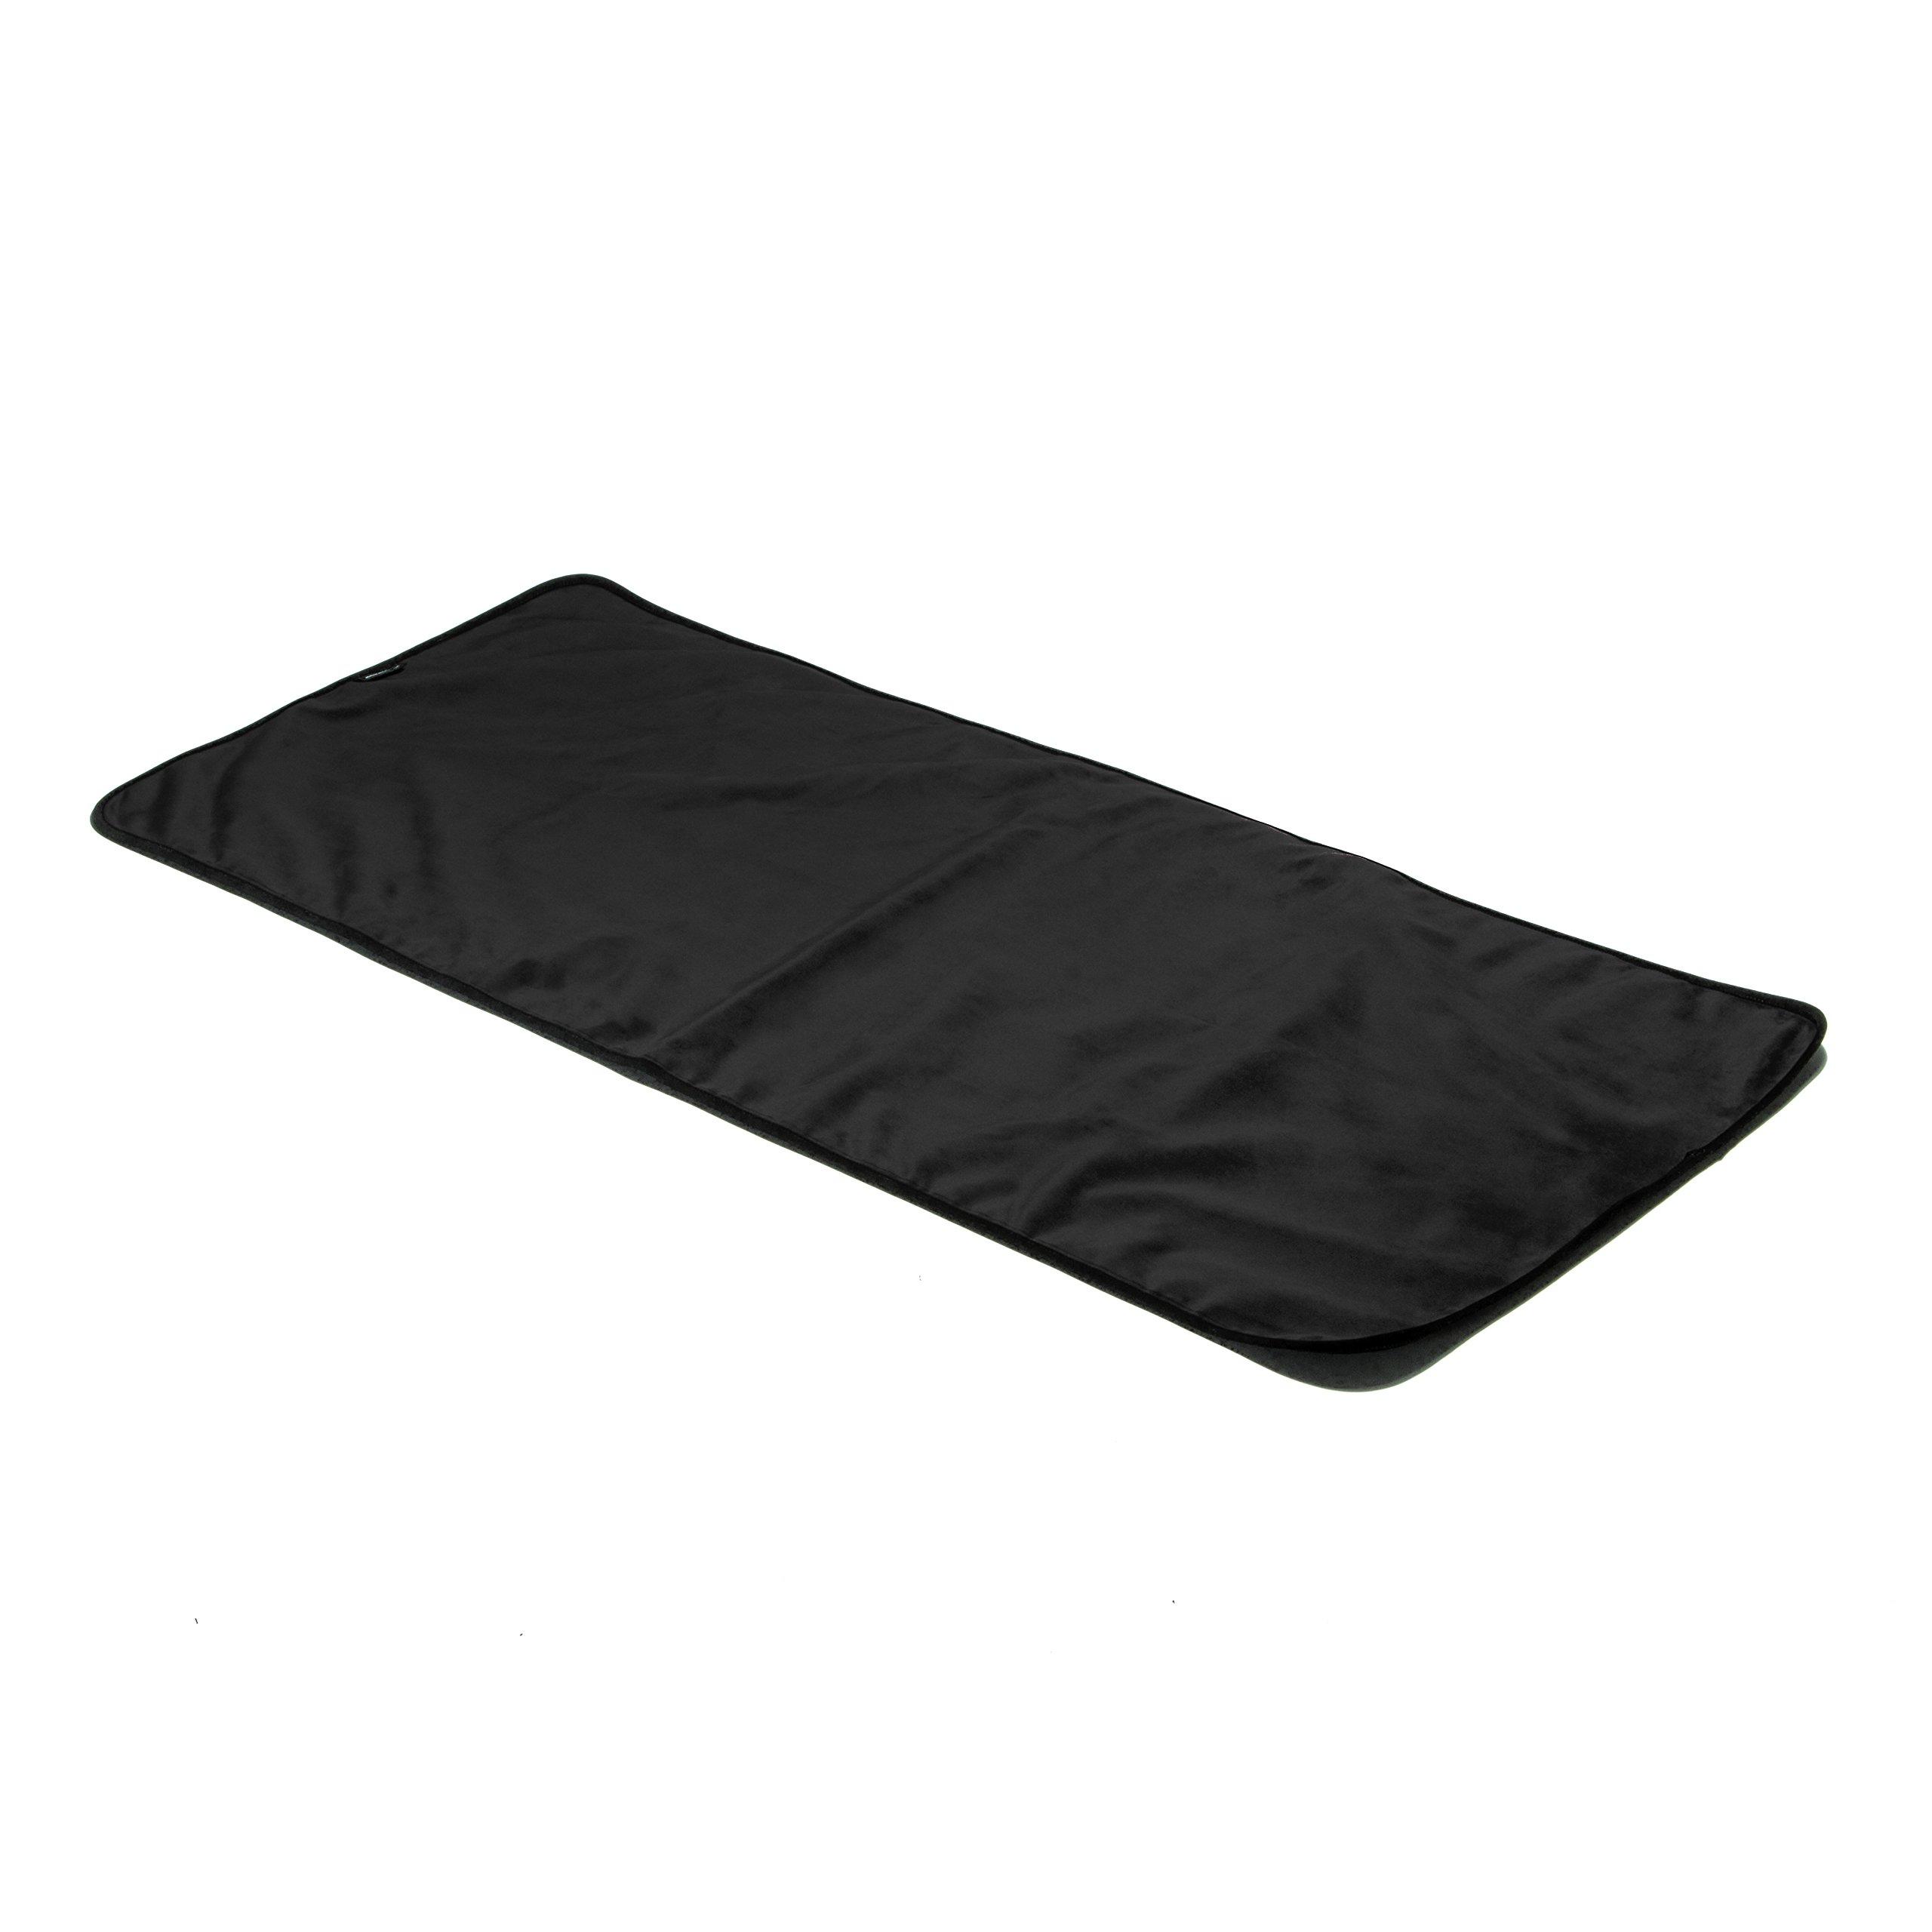 Liberator Throe Moisture Resistant Sex Blanket, Travel-Size, Black